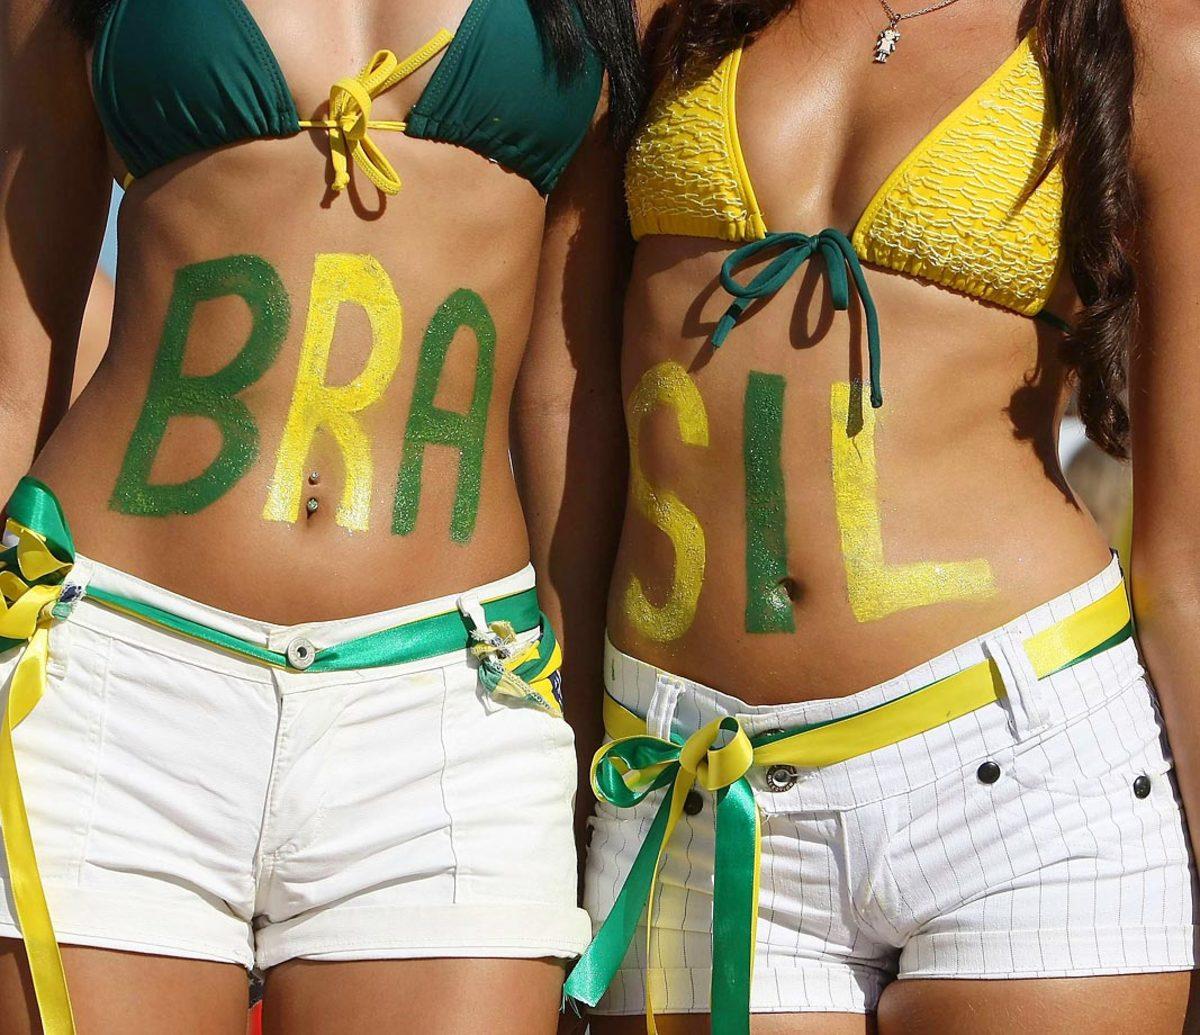 01 1 a brazil-beaches-28321081.jpg.filepart_1.jpg